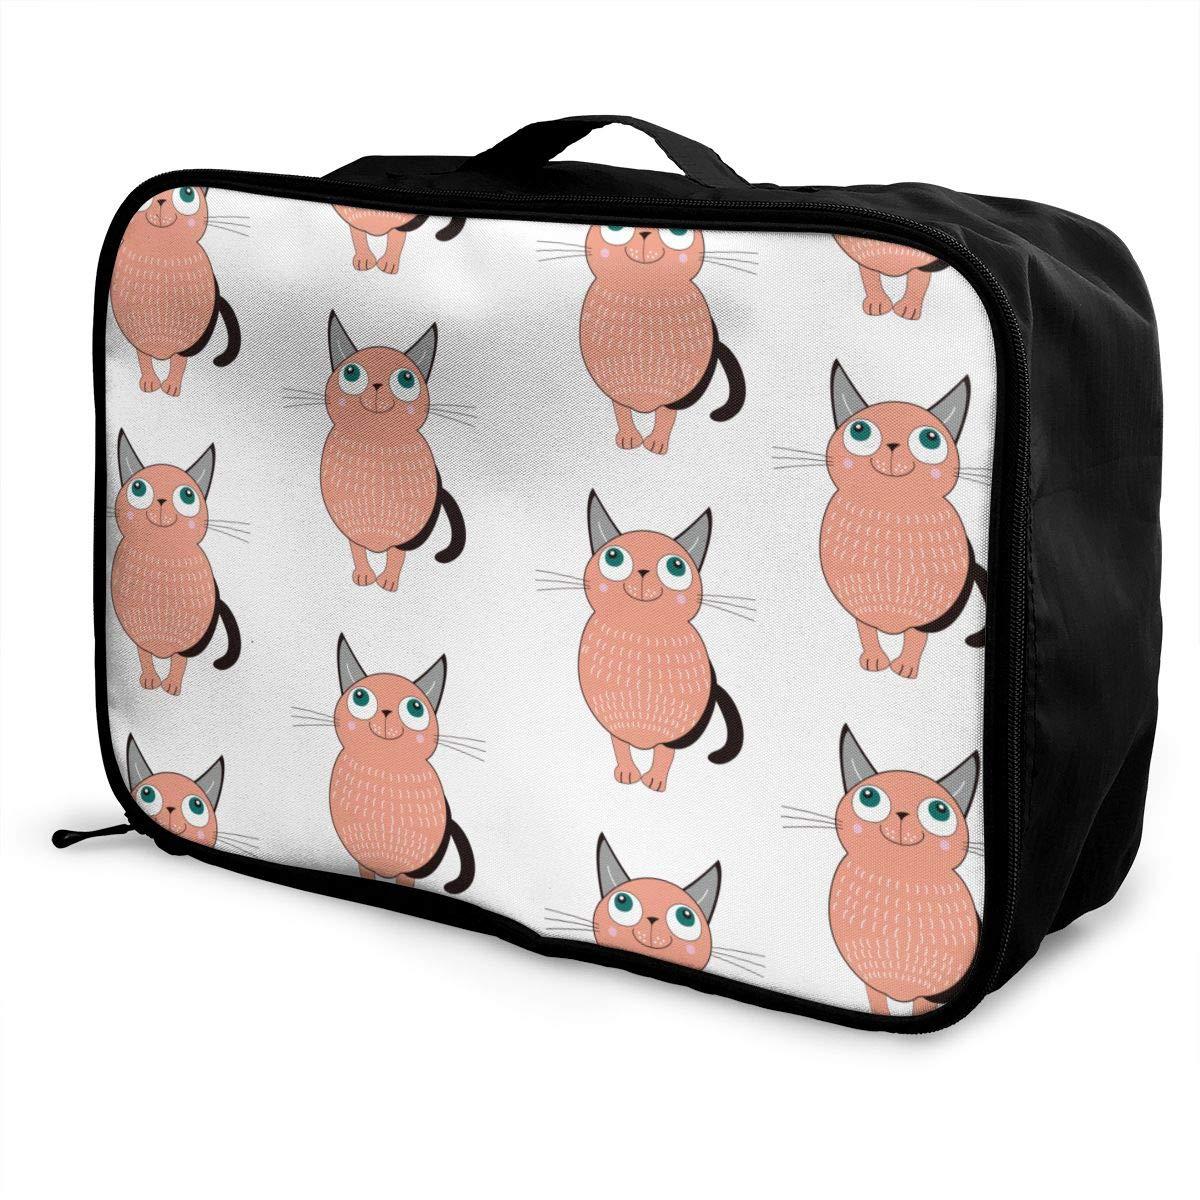 Cute Cat Travel Luggage Storage Bag Duffel Bag Handle Makeup Bag Fashion Lightweight Large Capacity Portable Luggage Bag